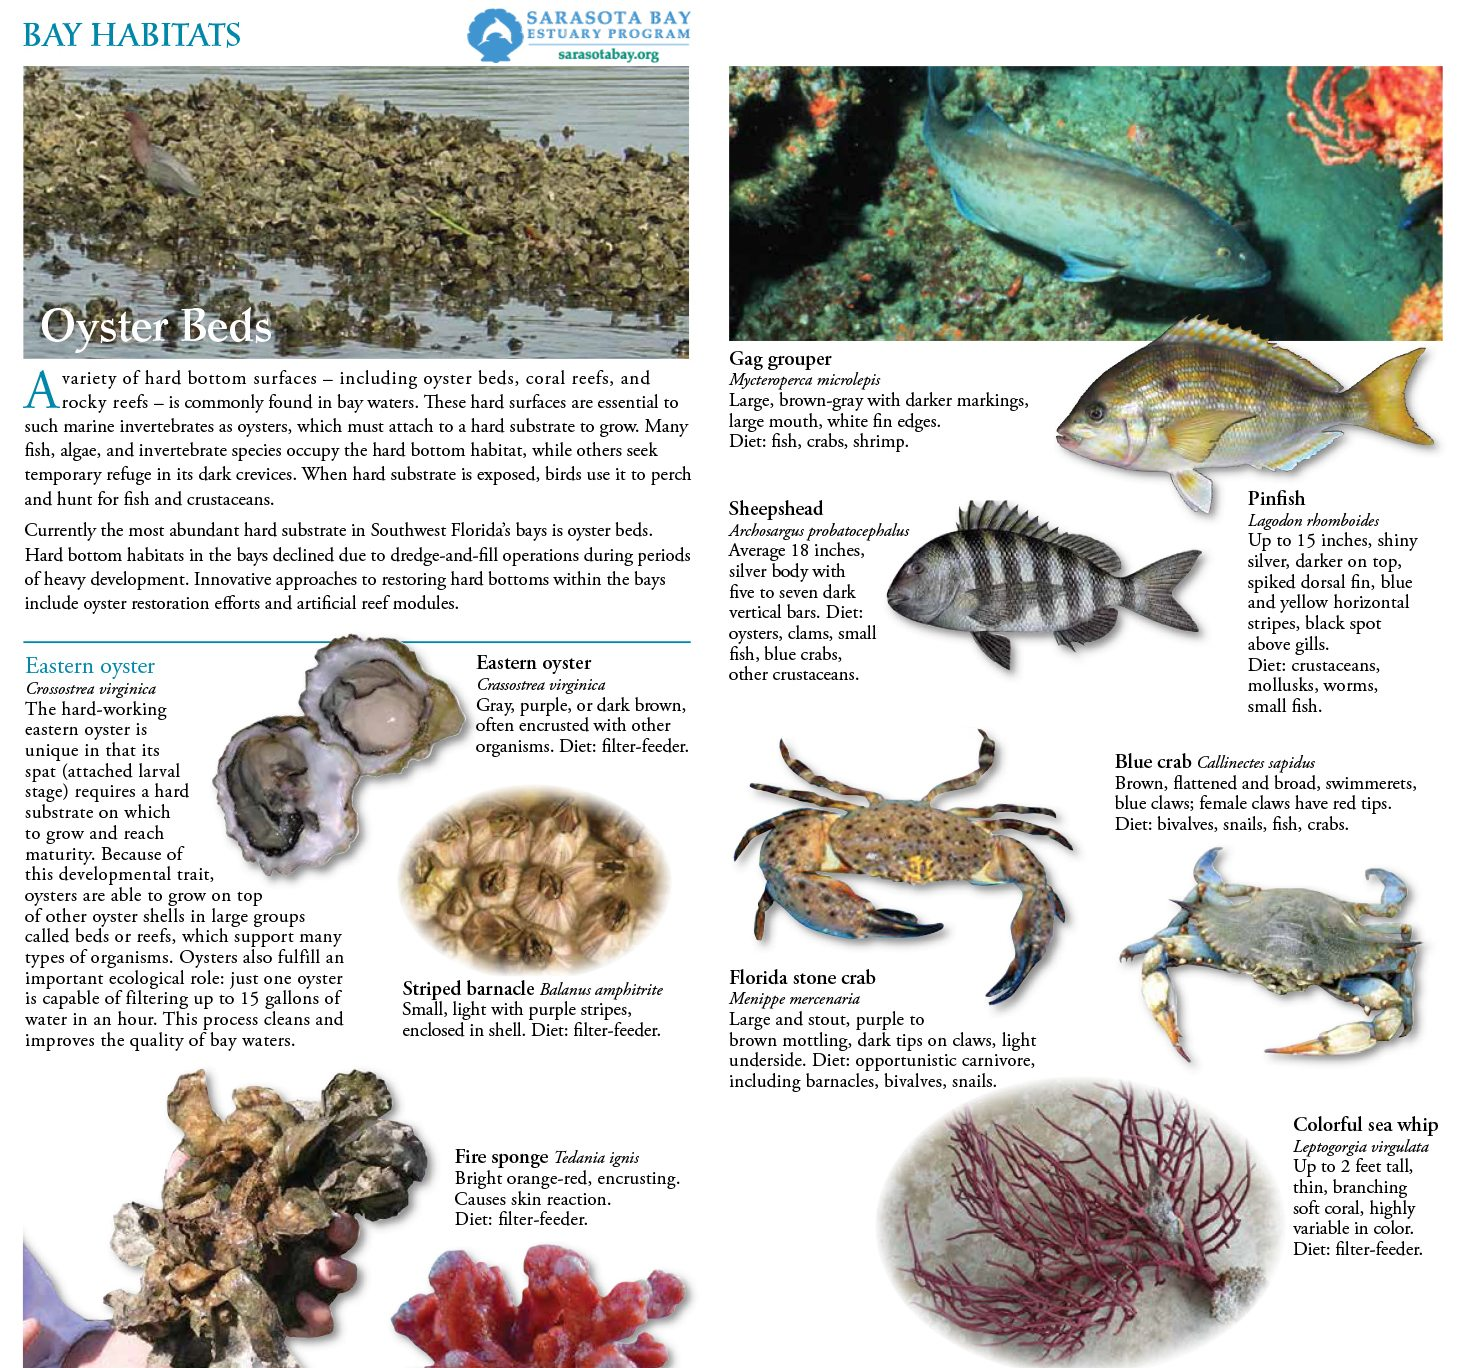 Field Guides: Sarasota Bay Estuary Program